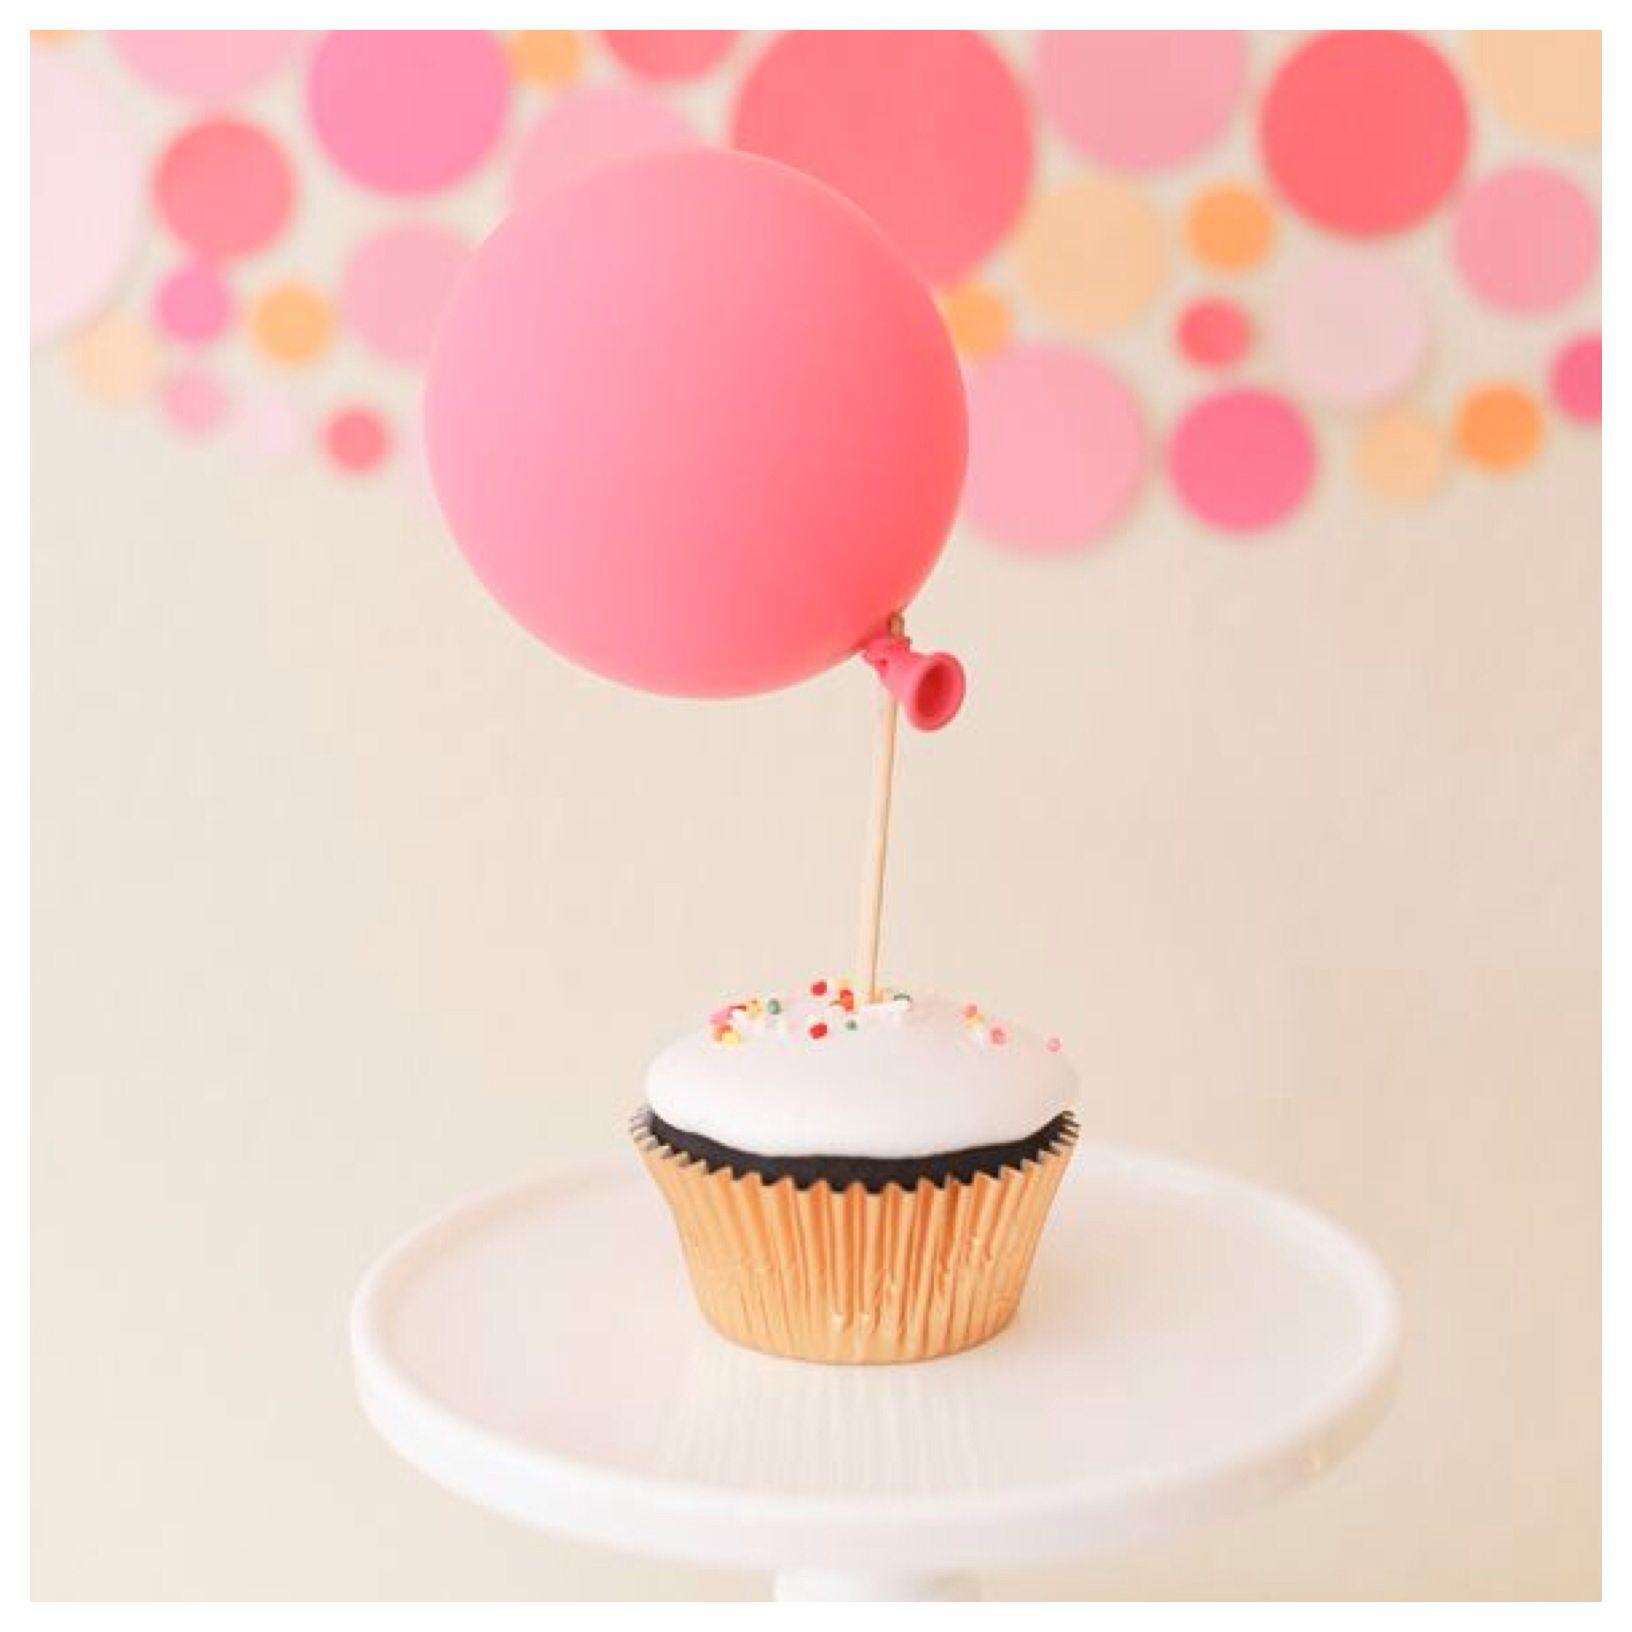 Balloon Cupcake x